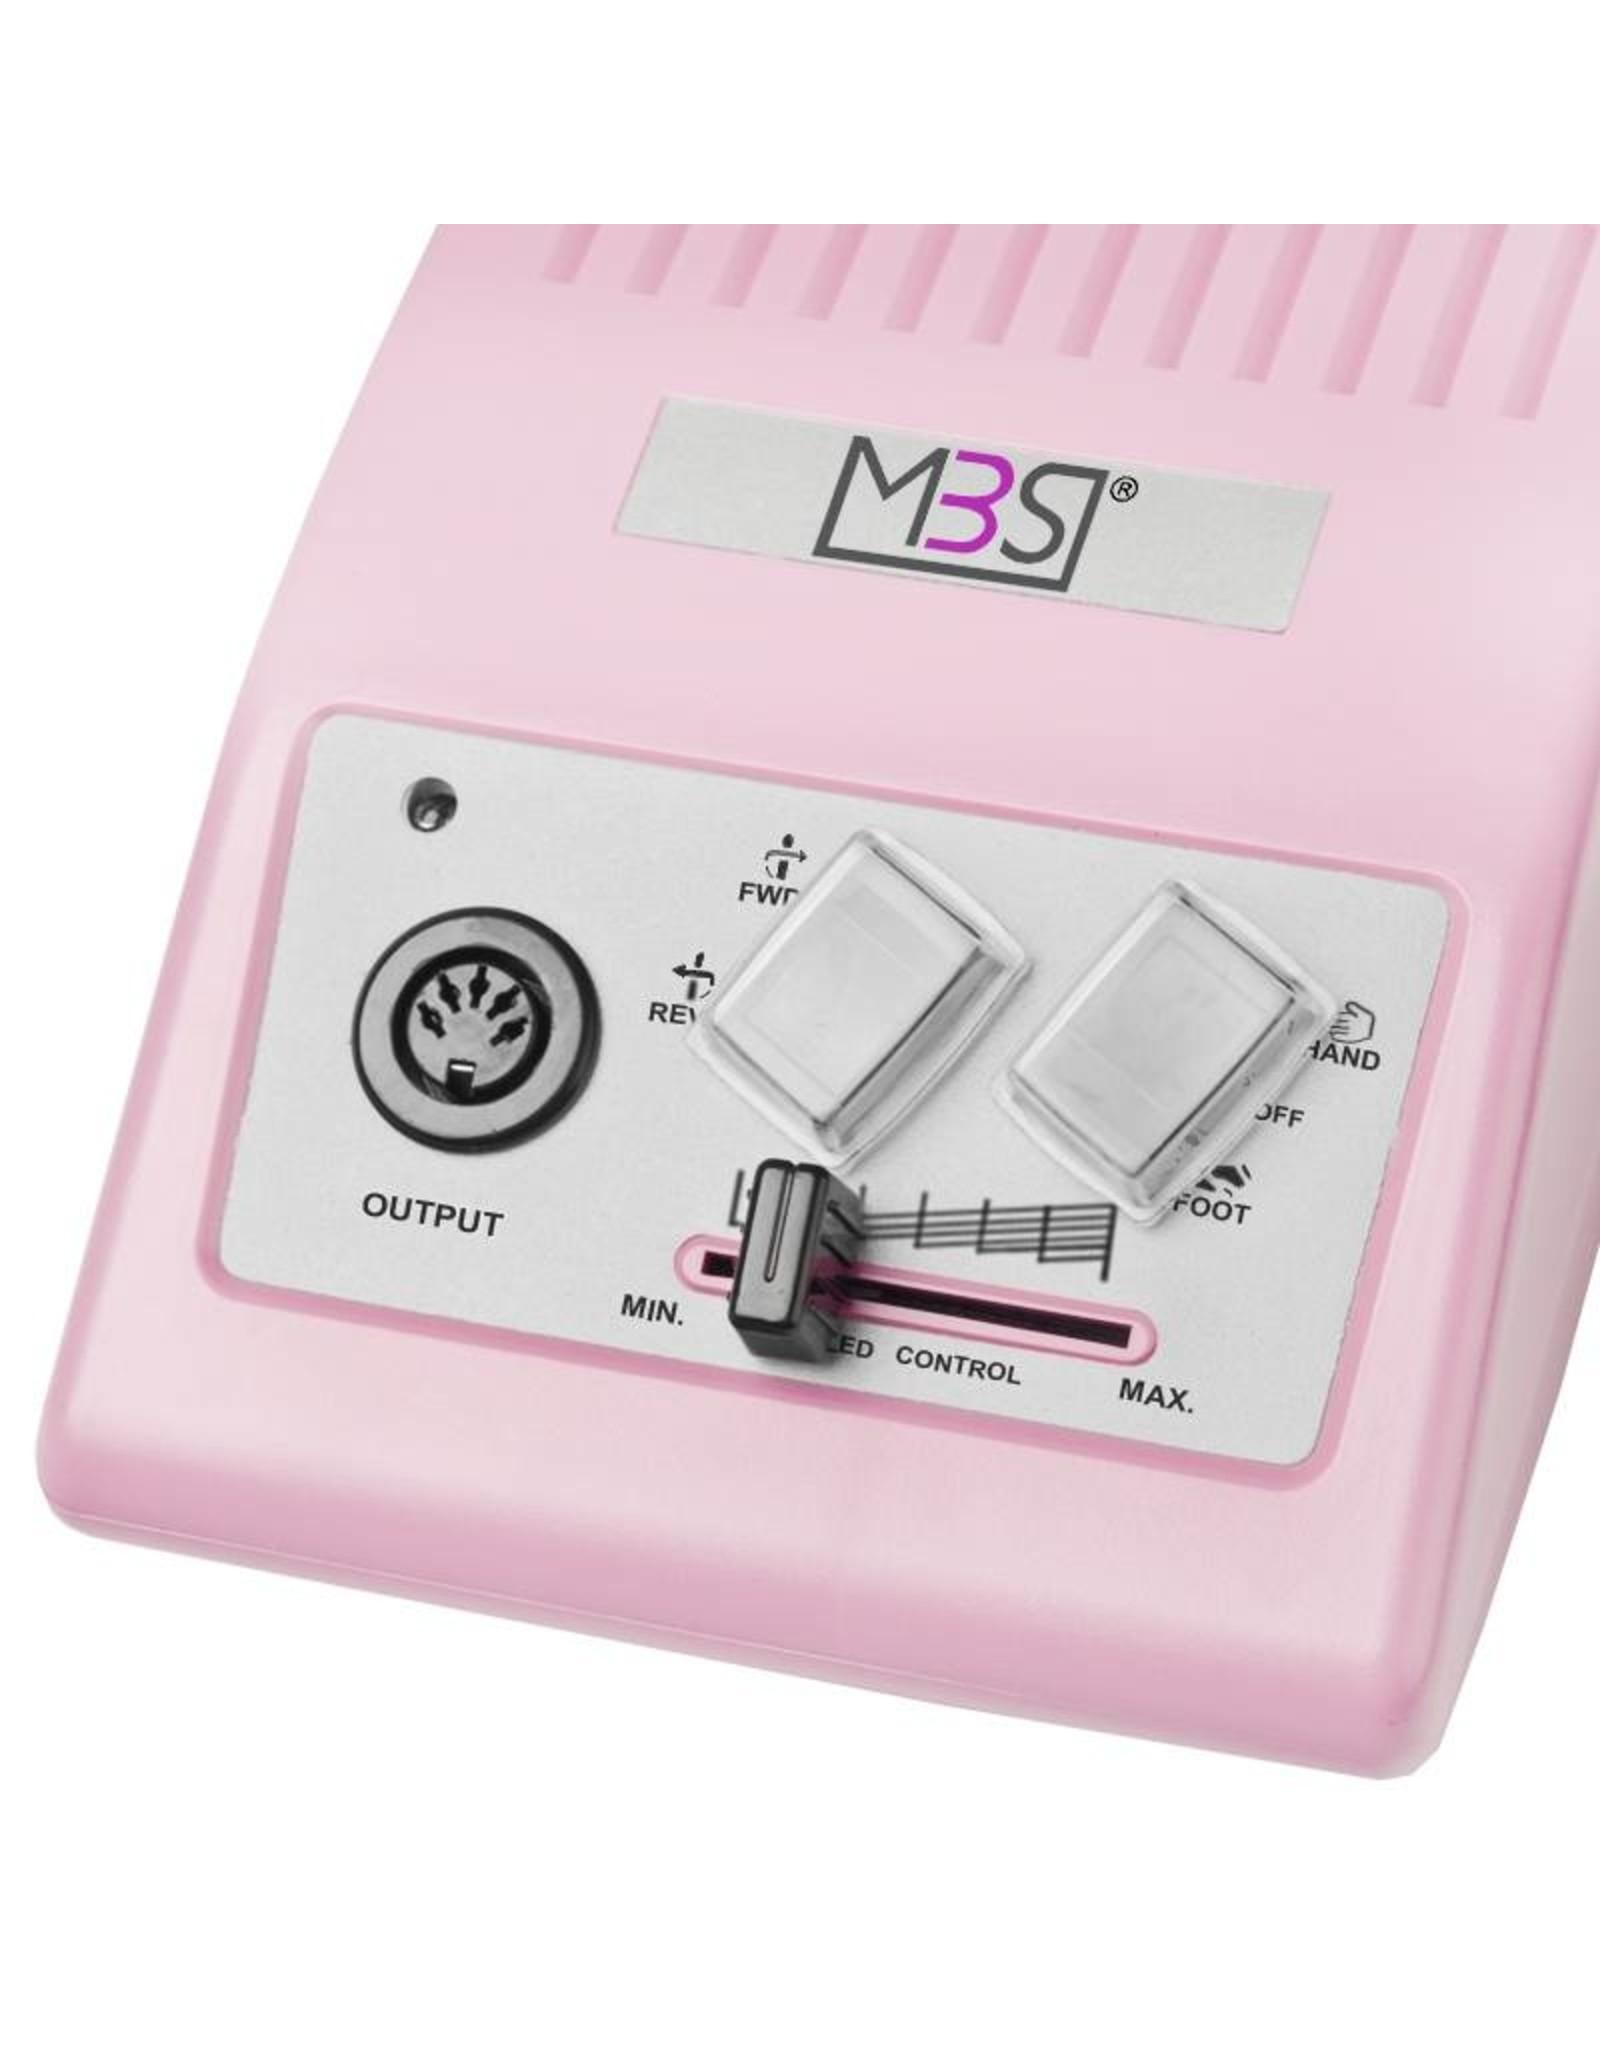 Merkloos Nagelfrees JD500 35Watt -Roze